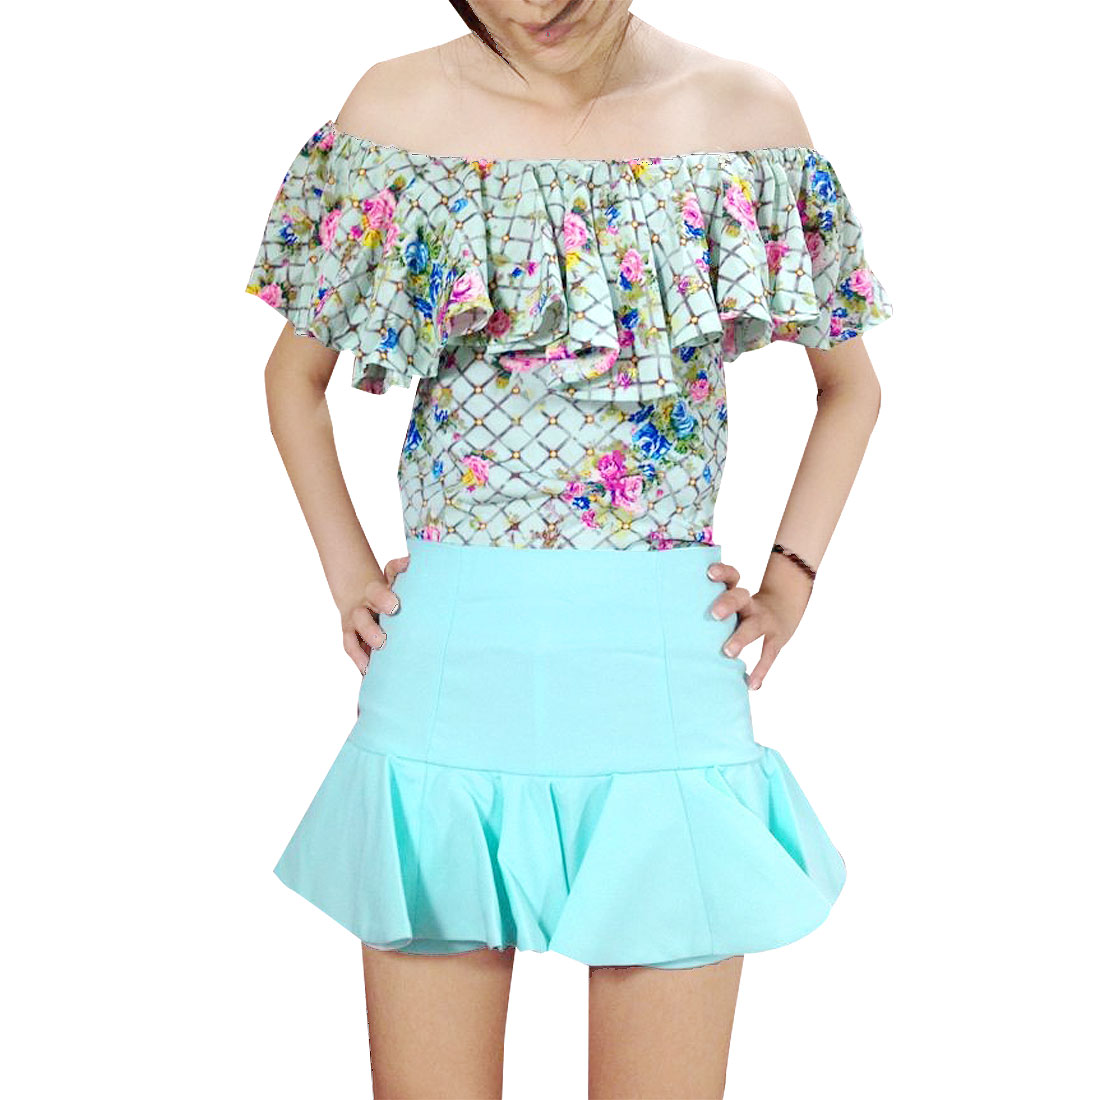 Women Self Tie Shoulder Strap Blouse + Pale Cyan Flounce Decor Divided Skirt XS